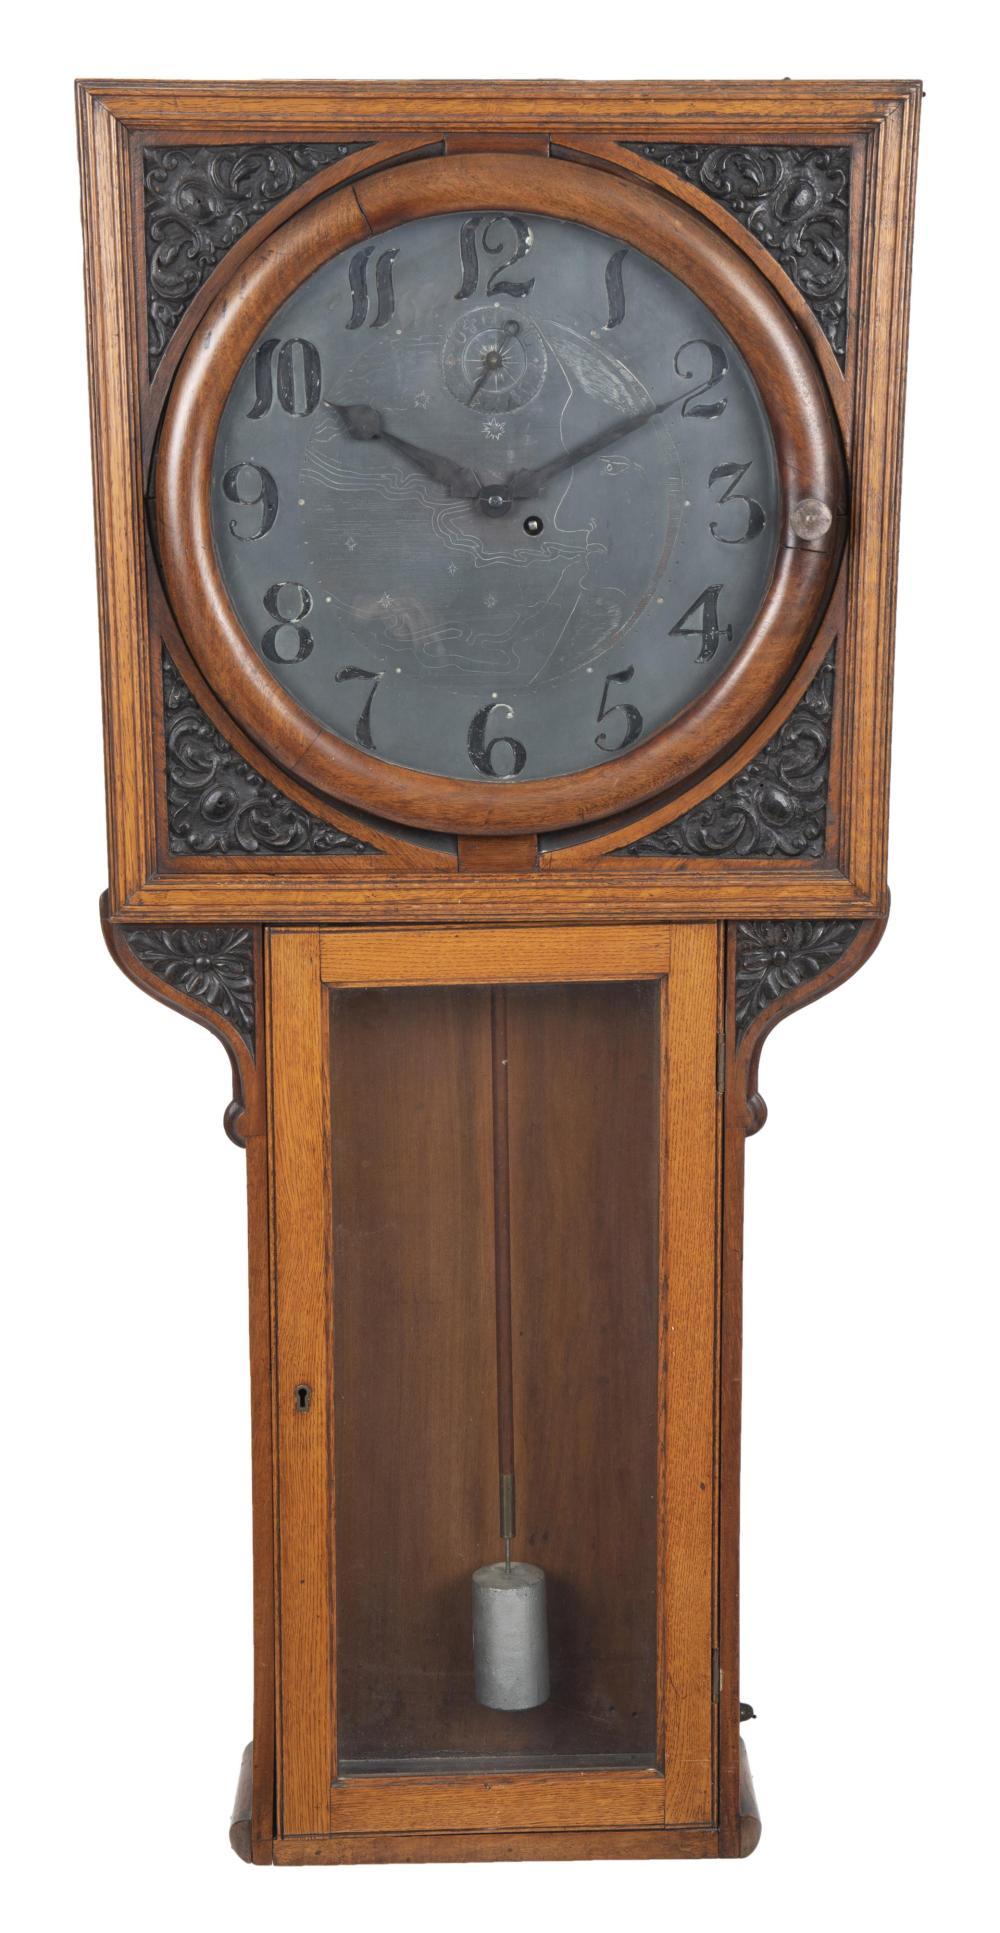 An English pub wall clock